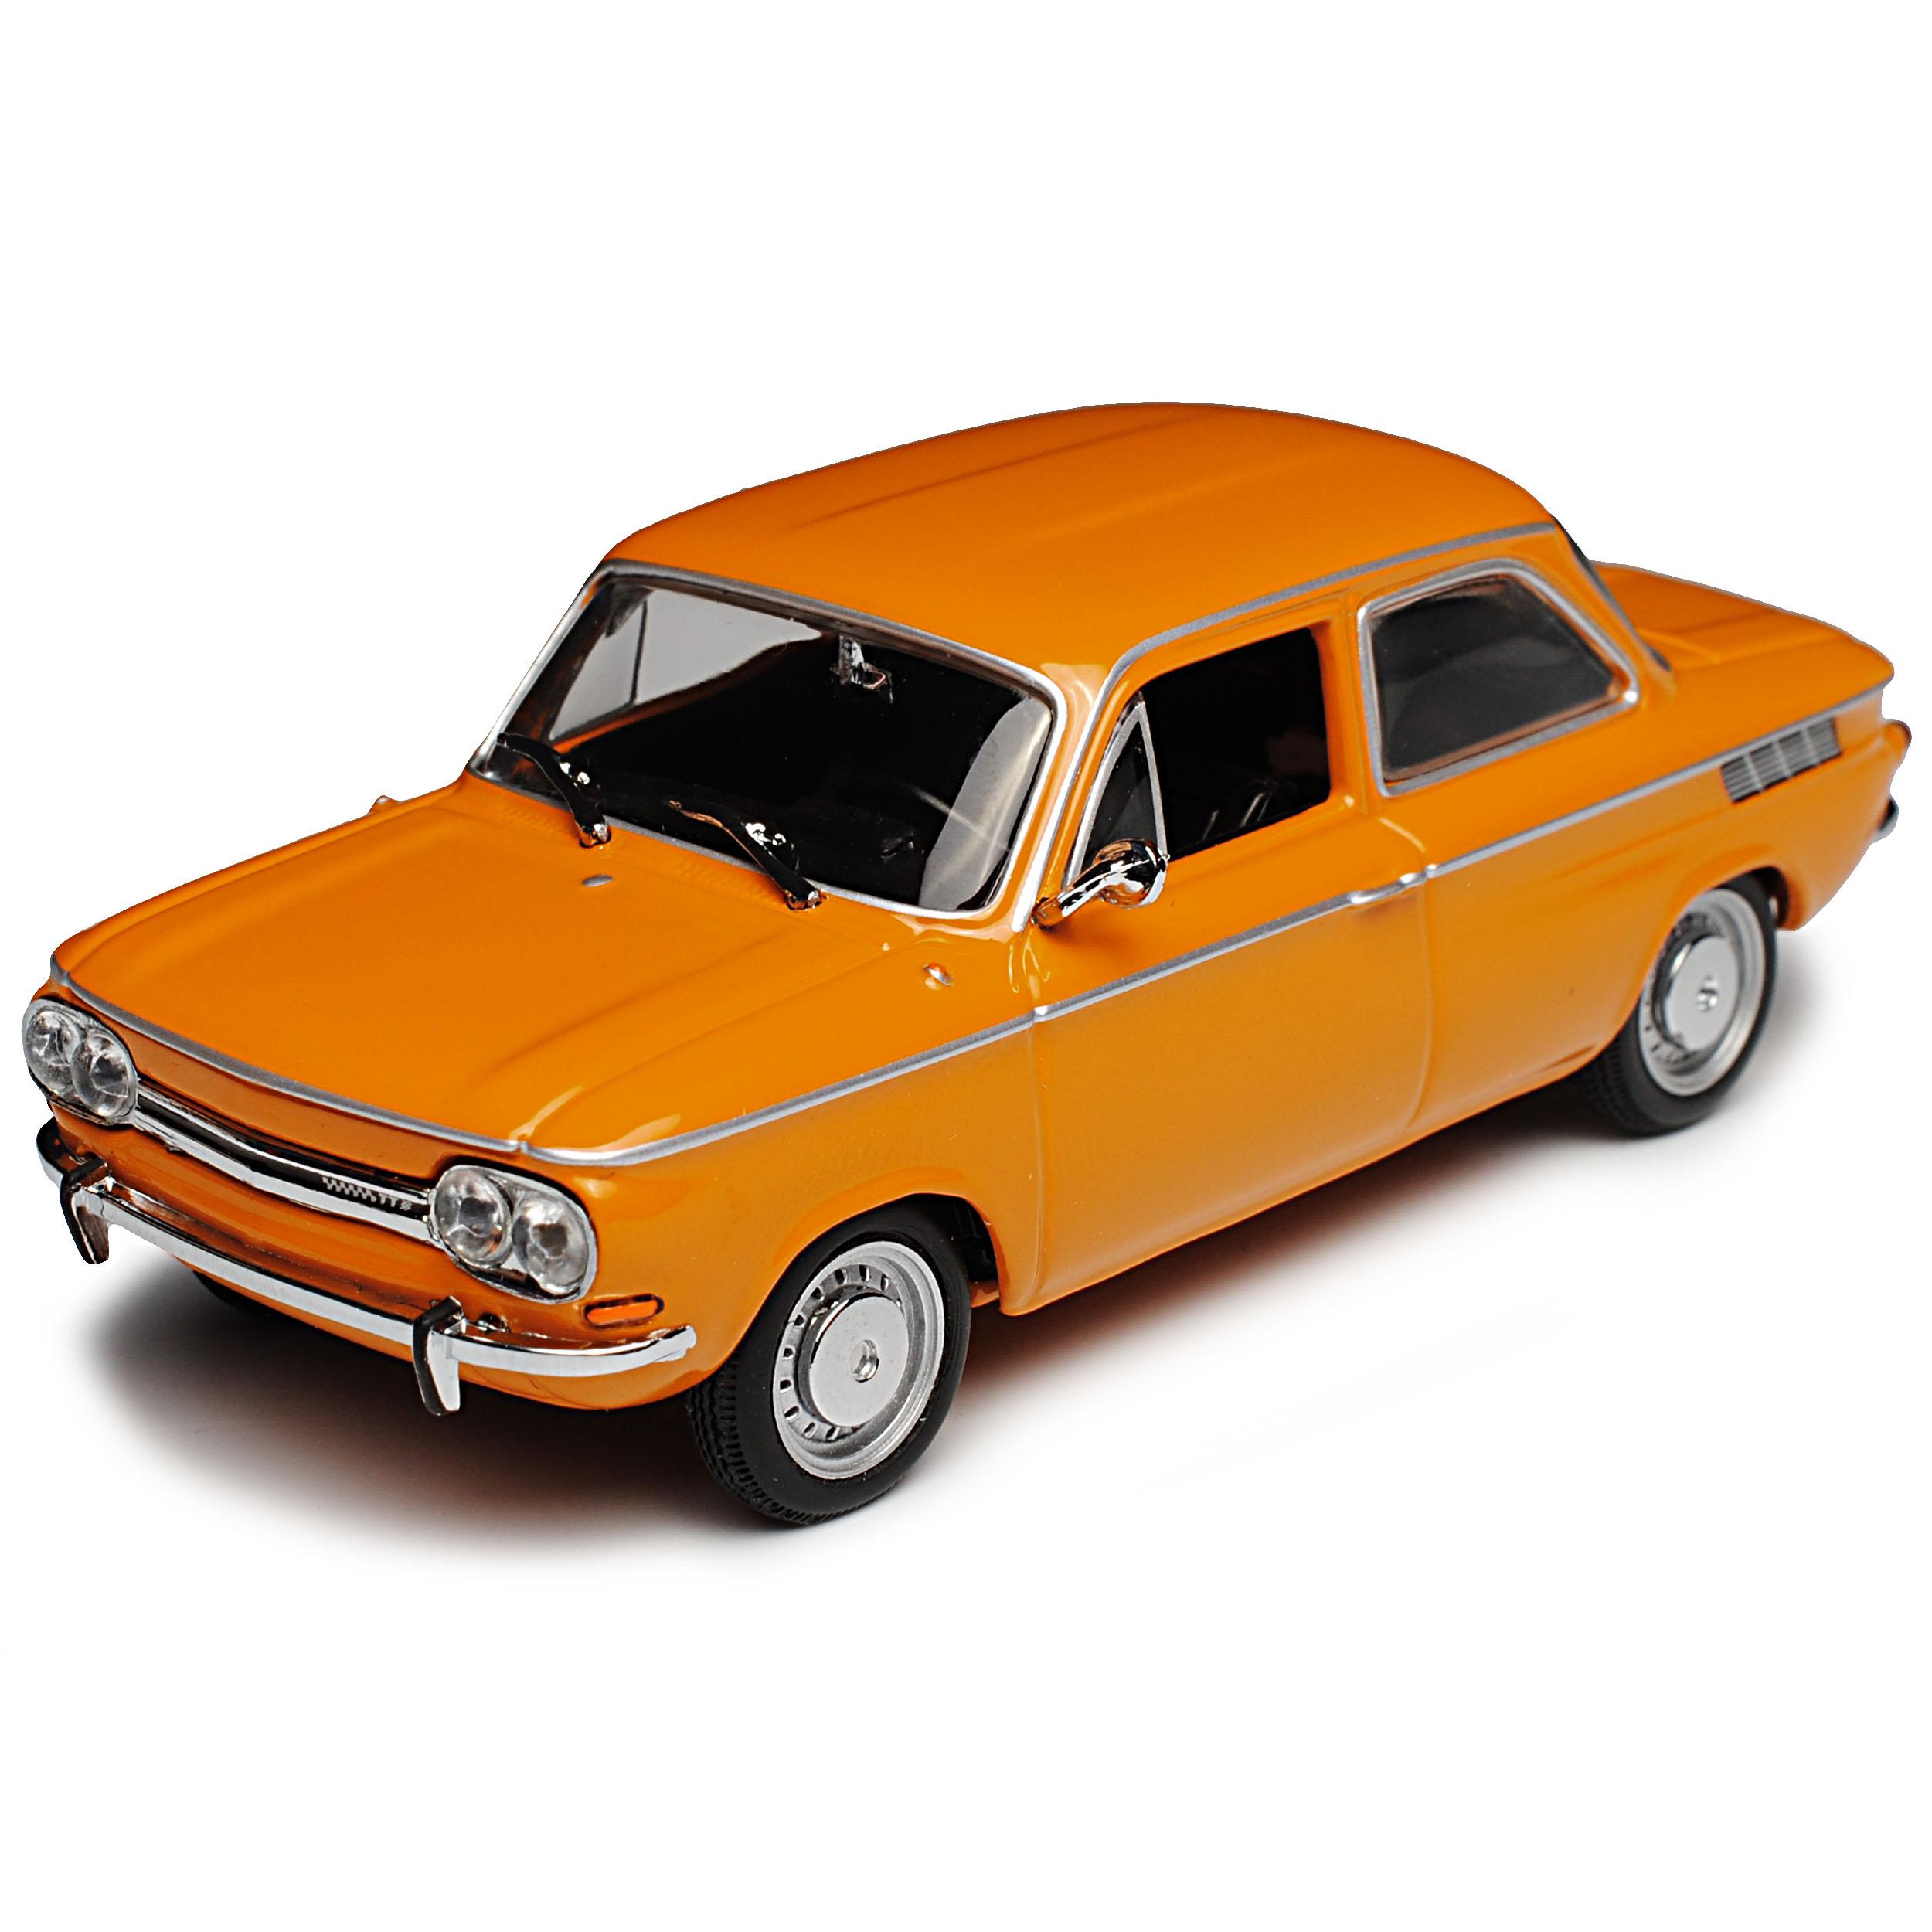 NSU TT naranja 1965-1972 1 43 43 43 Minichamps maxichamps modelo coche con o sin I.. 0d8ba8